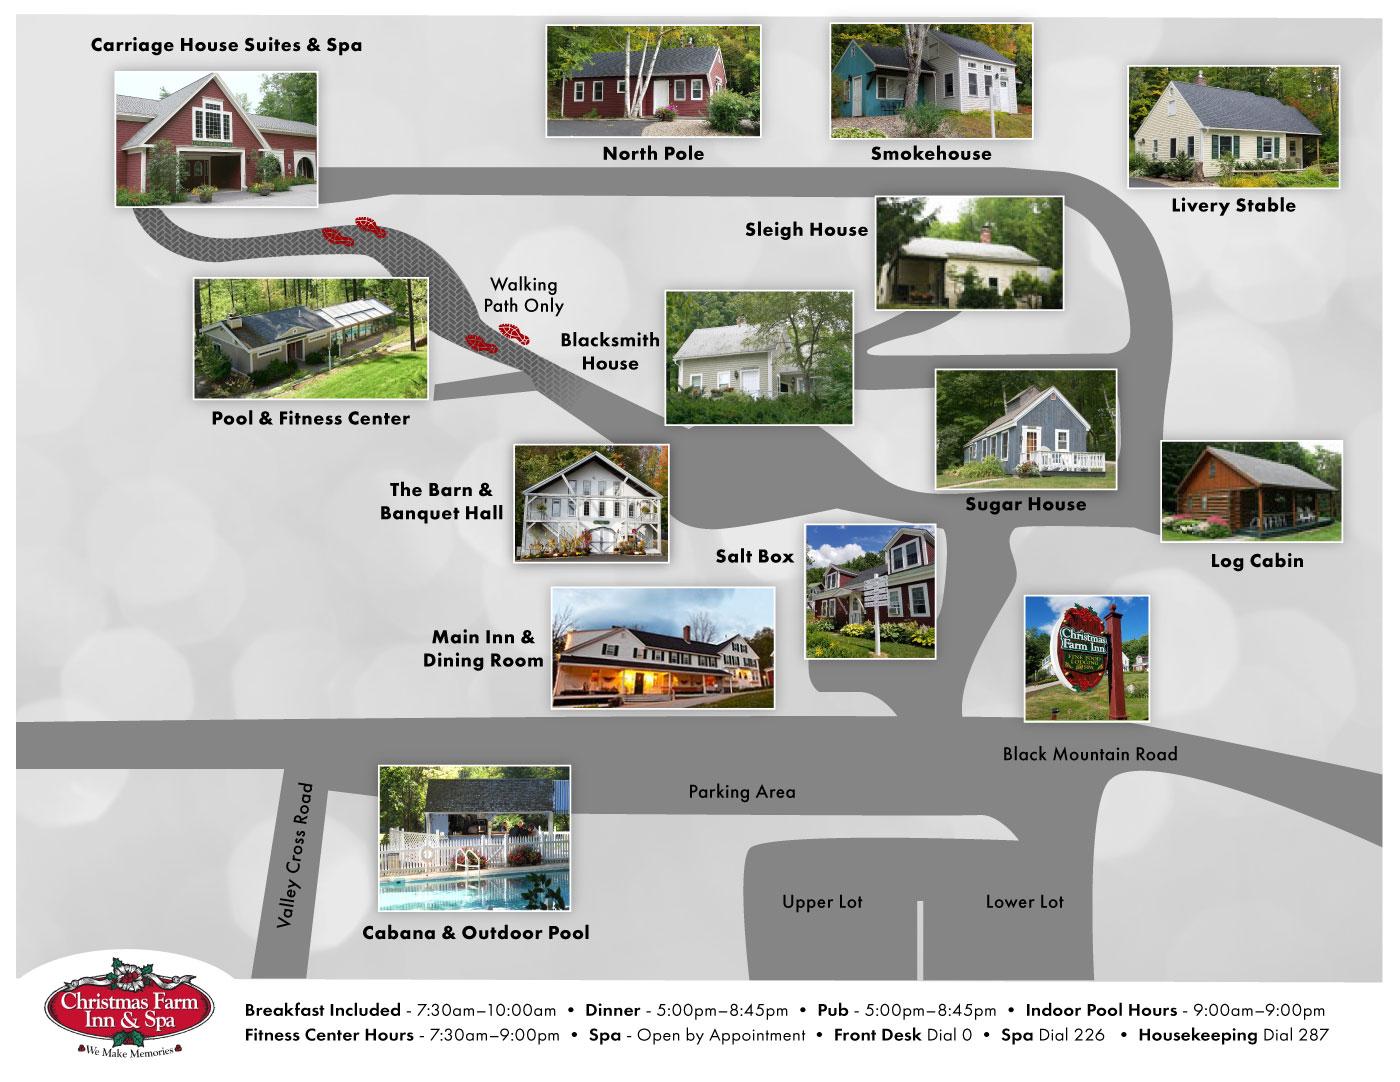 White Mountains Resort Property Map